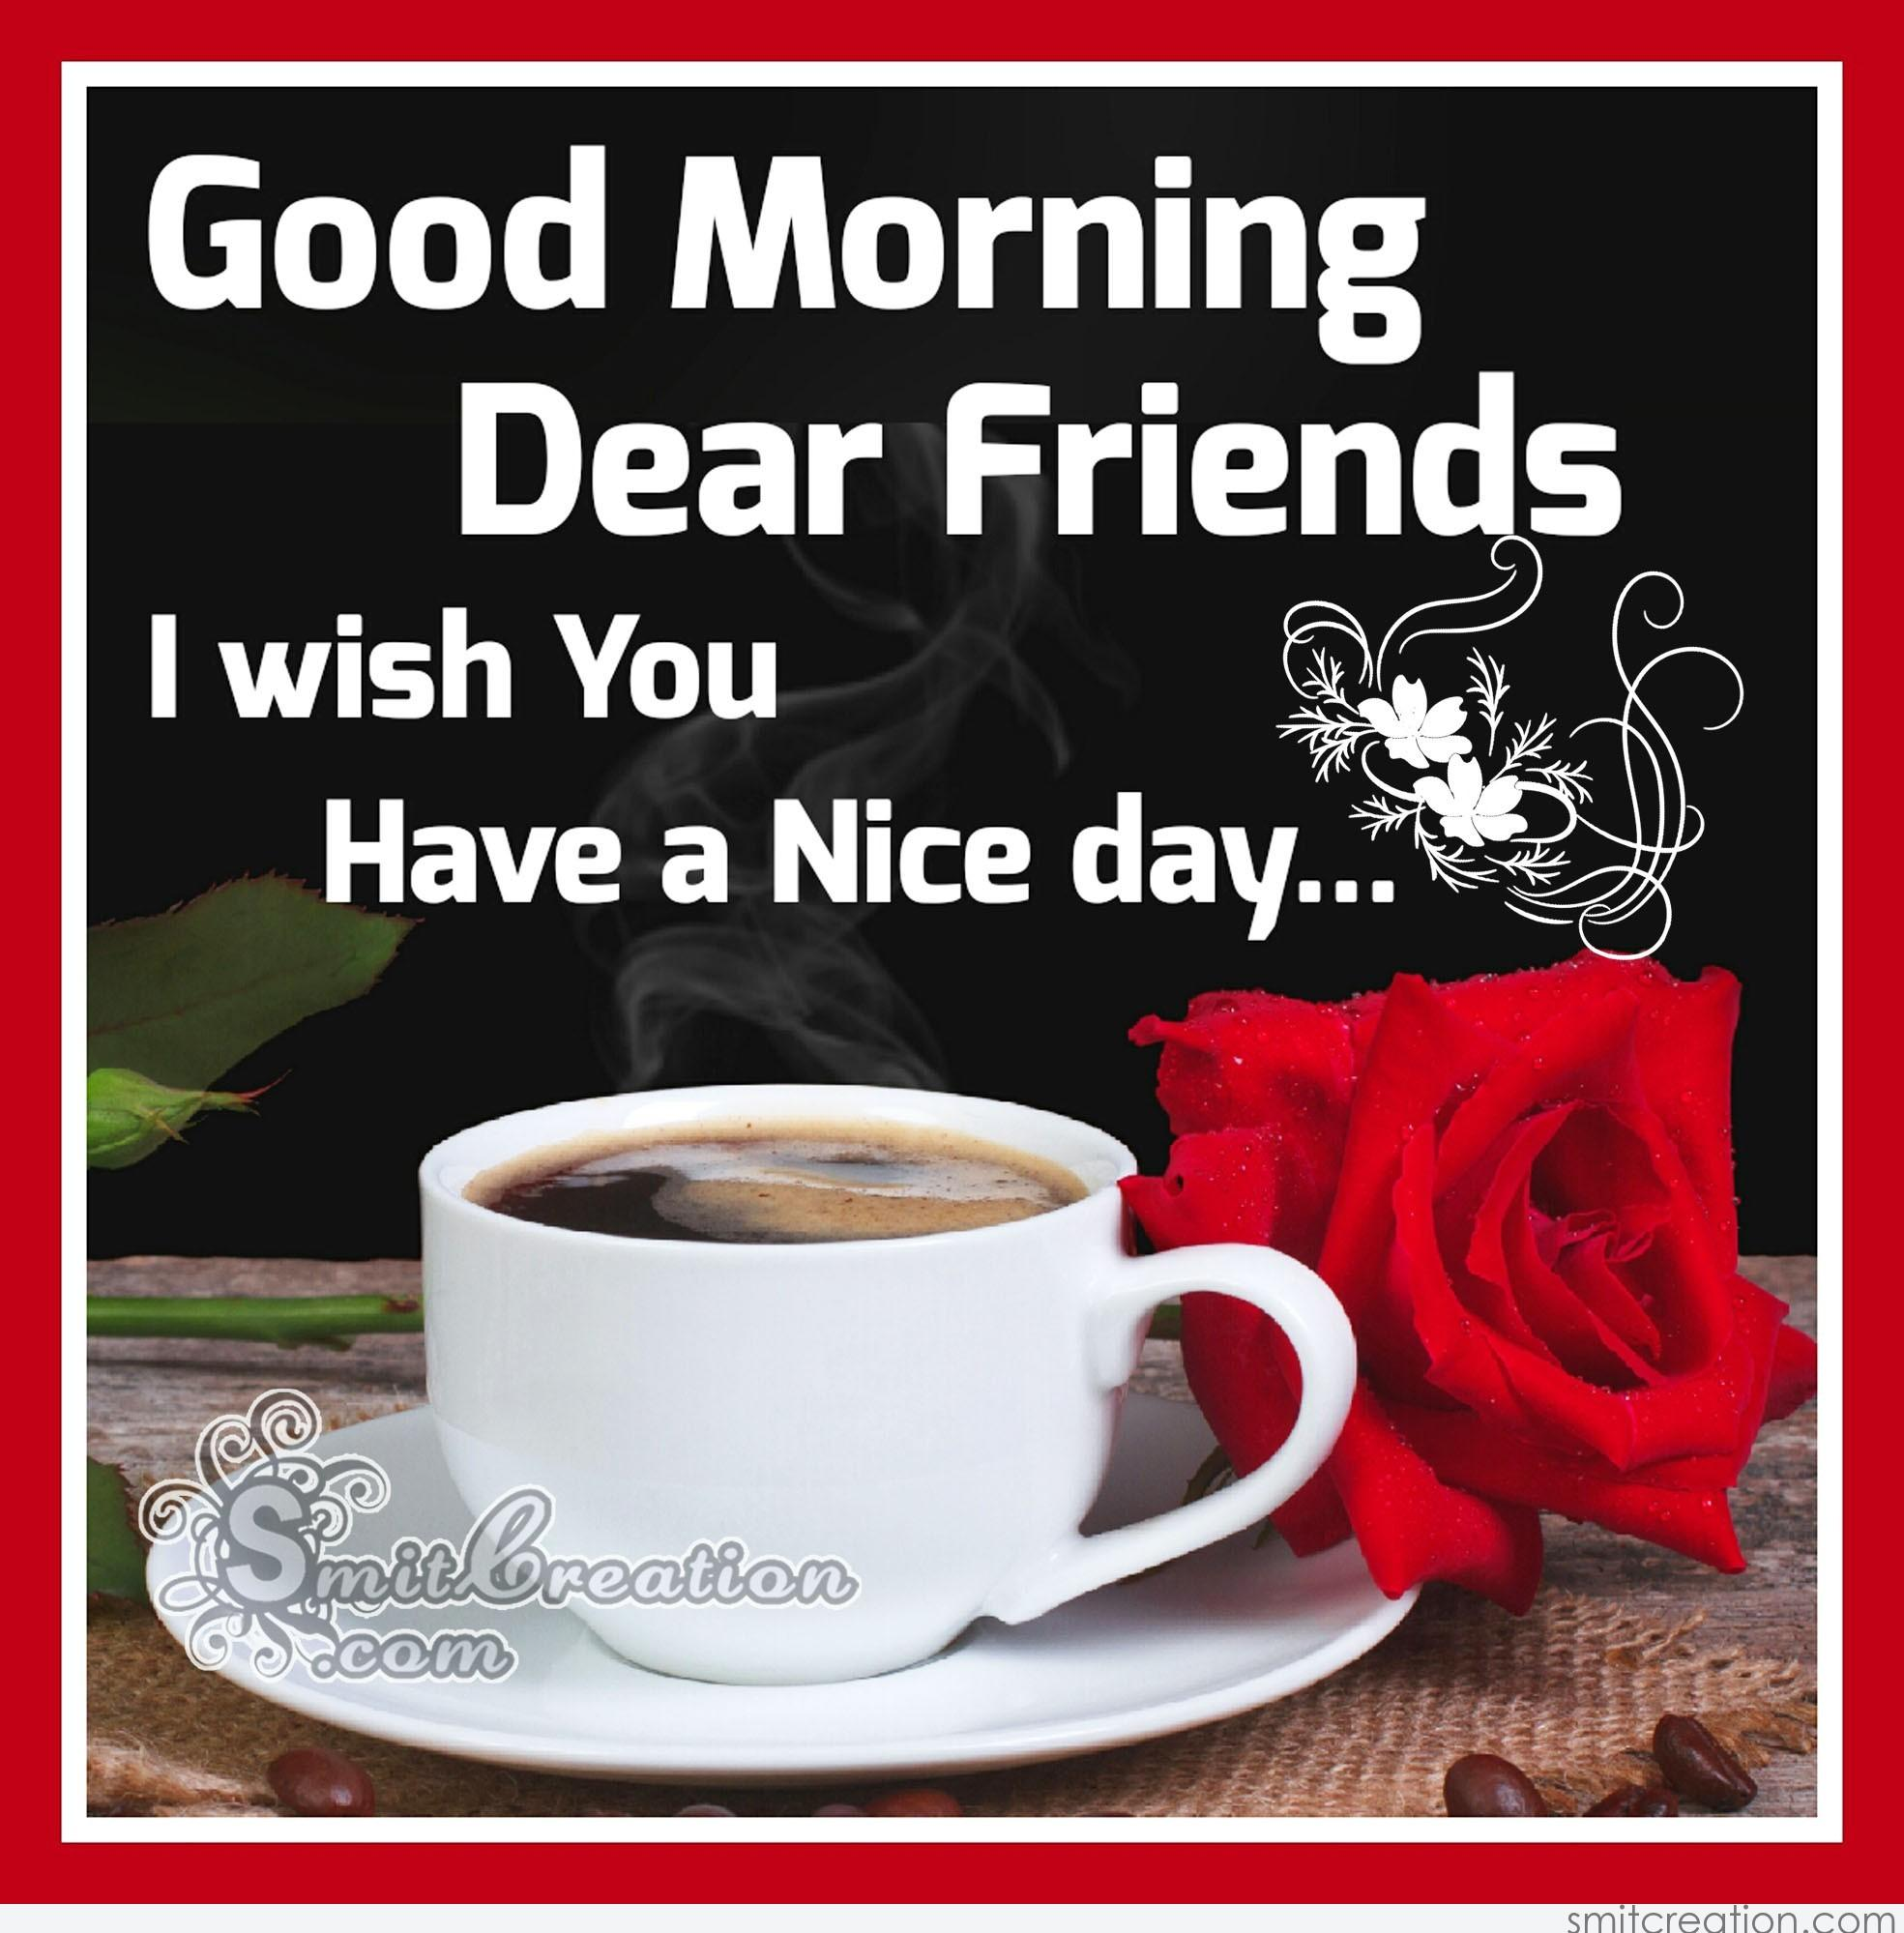 Good Morning Love Dear : Good morning my dear friends have a nice day